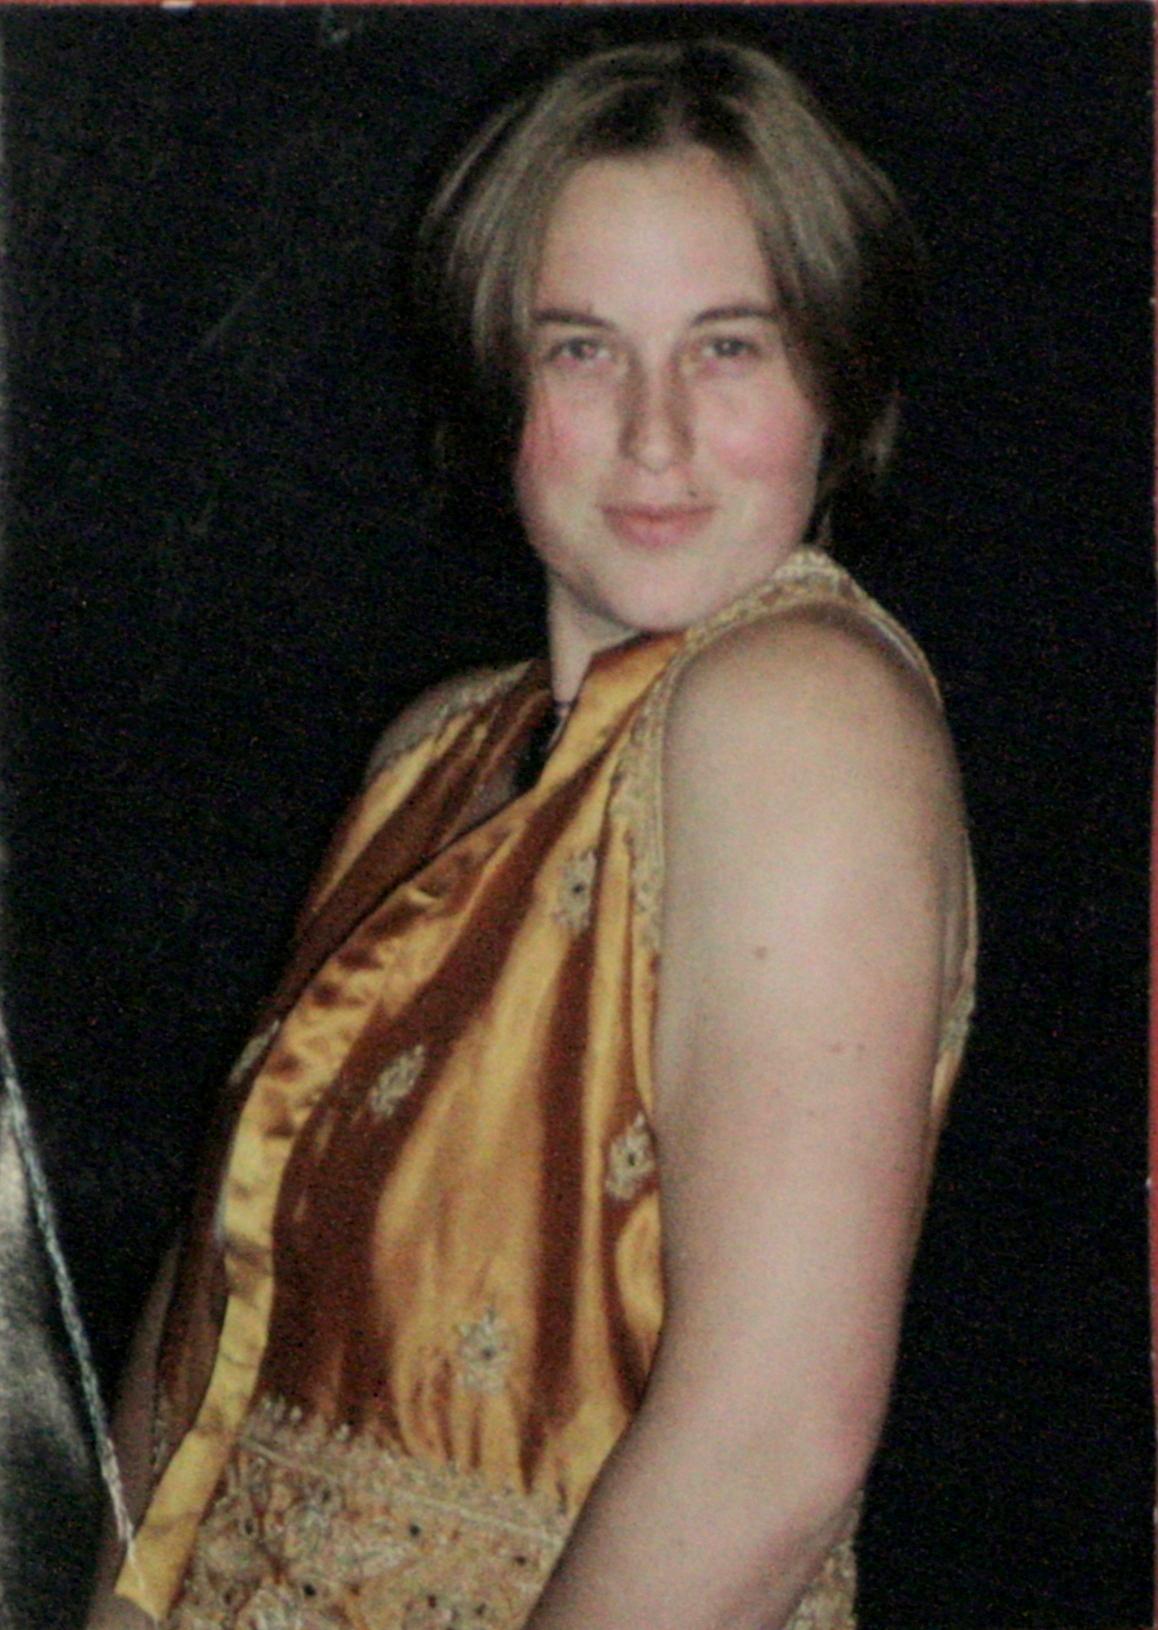 Joanne Haakma - sexy genie